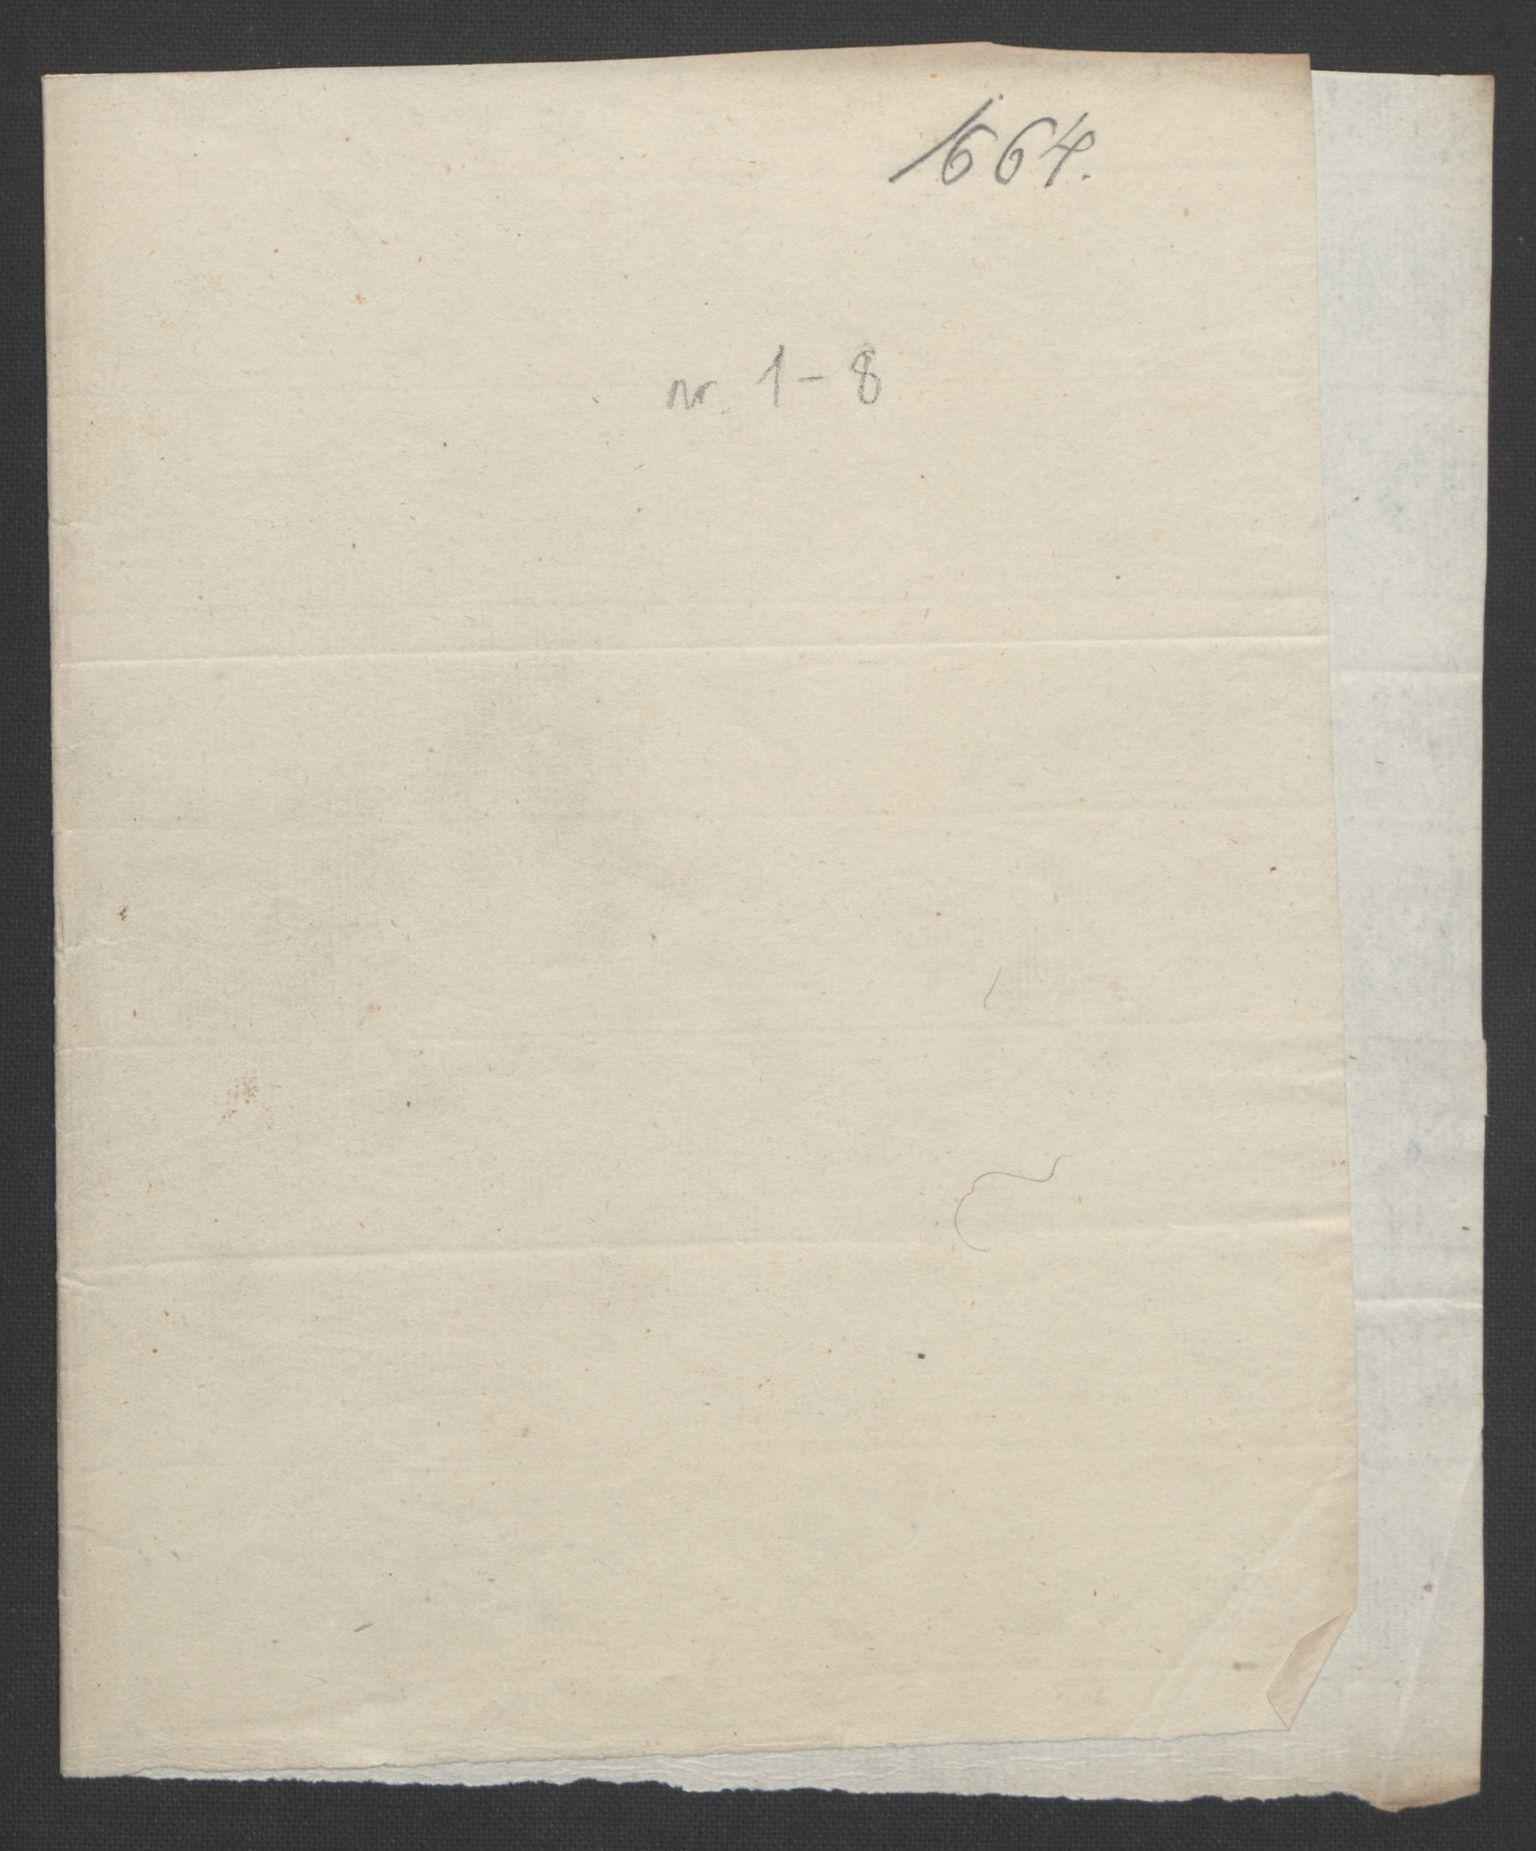 RA, Rentekammeret inntil 1814, Reviderte regnskaper, Fogderegnskap, R32/L1842: Fogderegnskap Jarlsberg grevskap, 1664-1673, s. 3